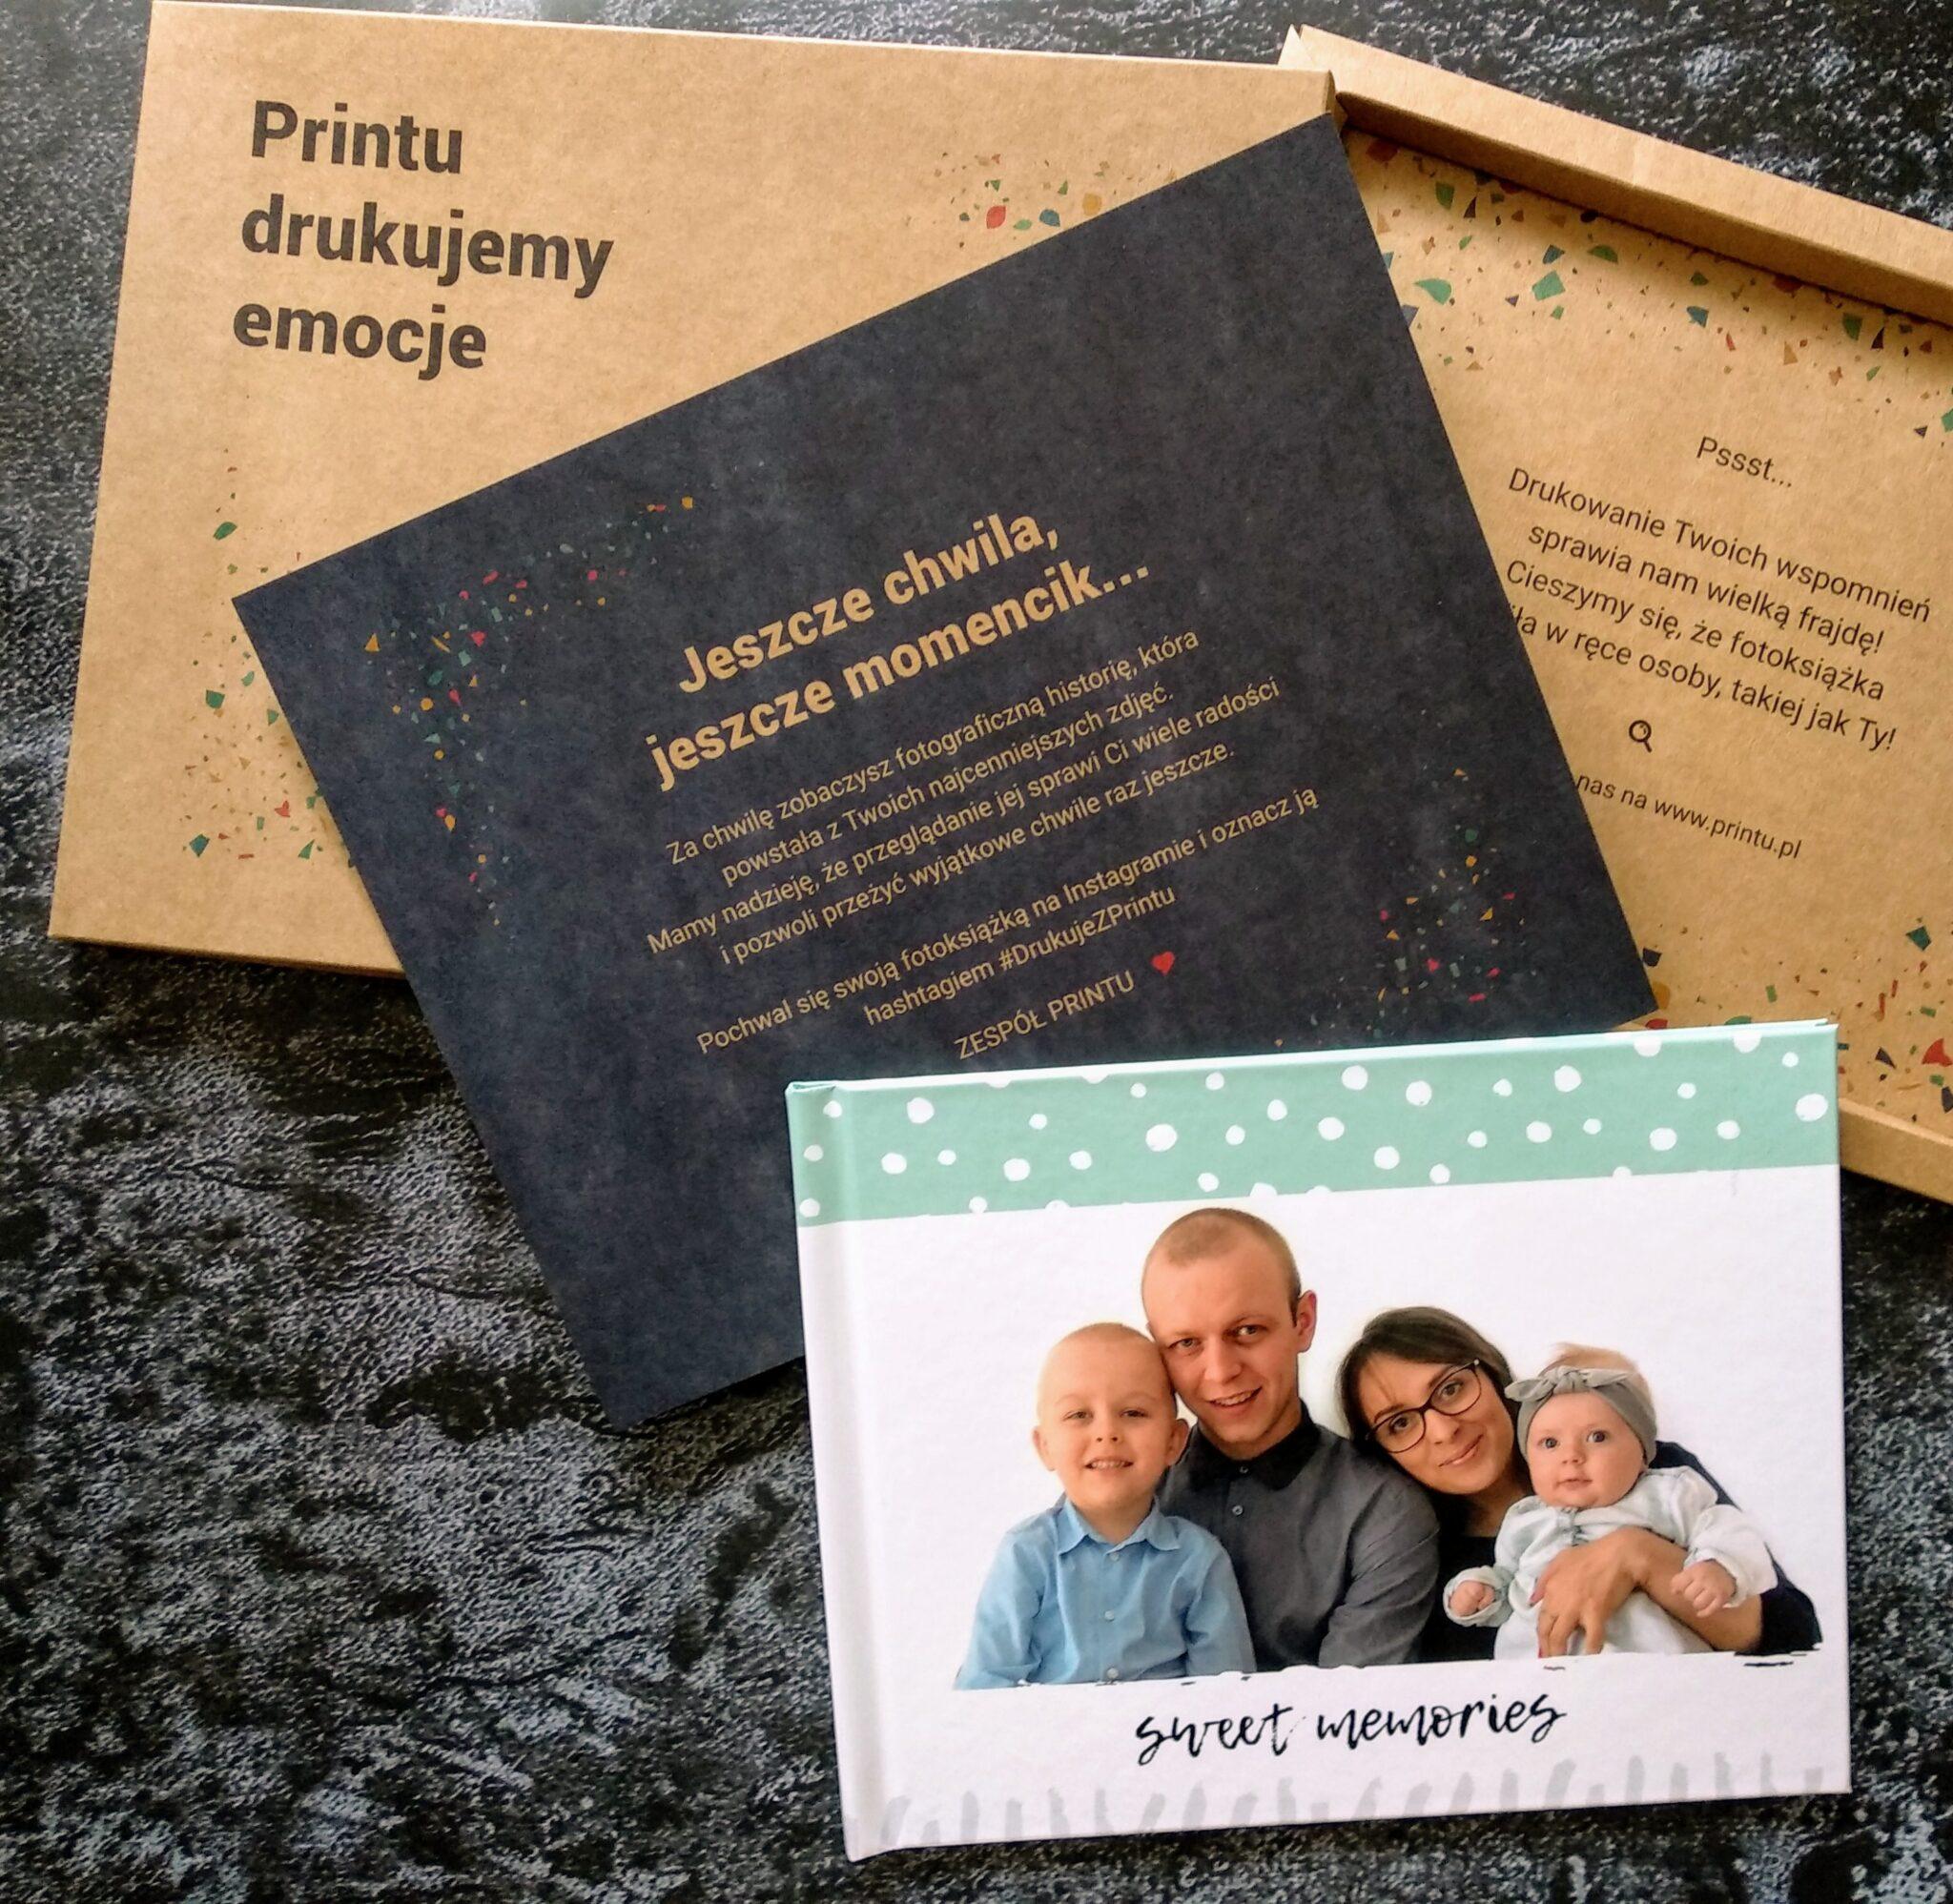 fotoksiążka prezent printu